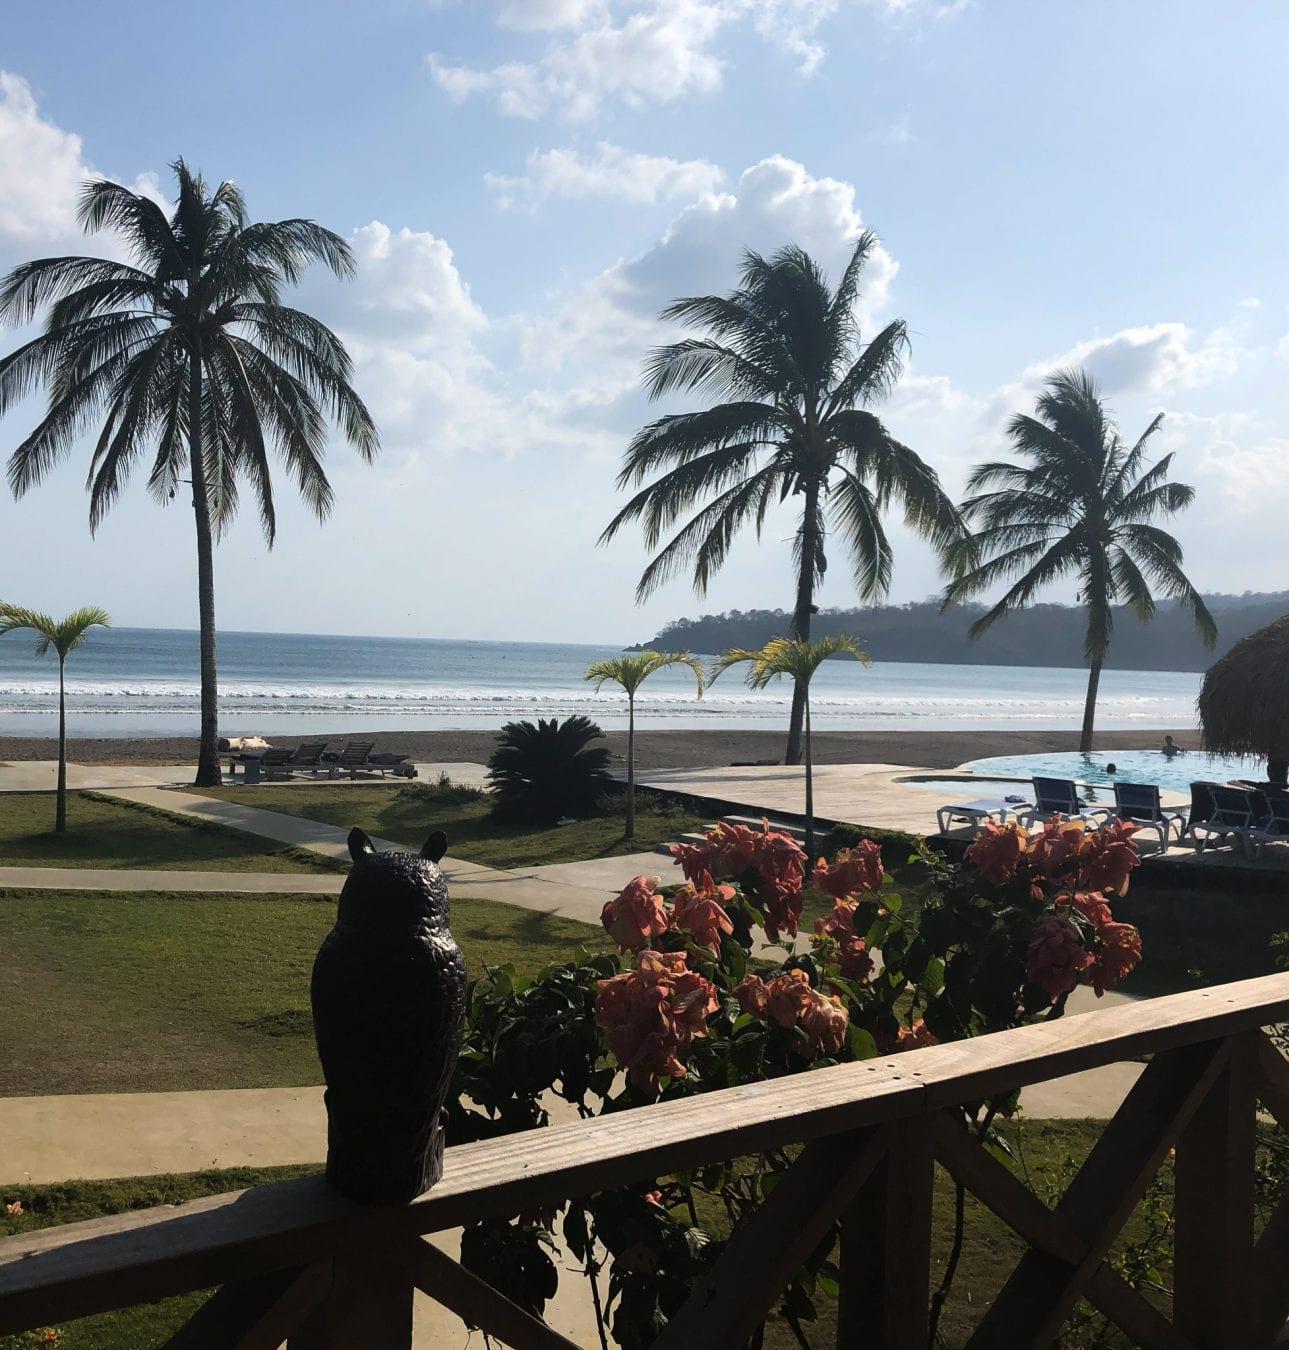 playa venao hotel